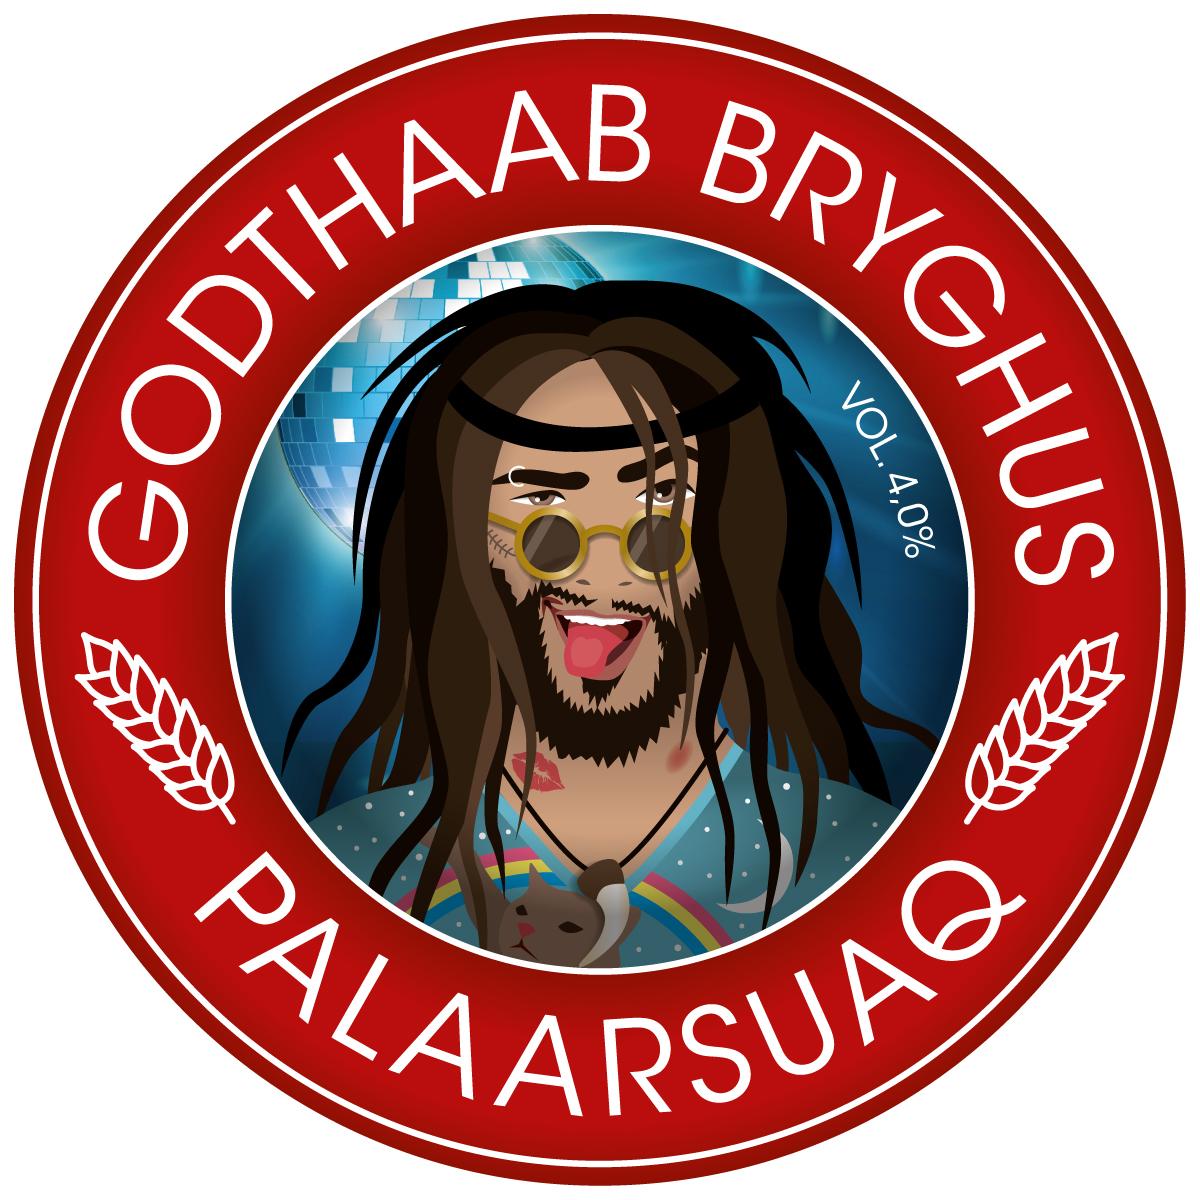 Palaarsuaq label